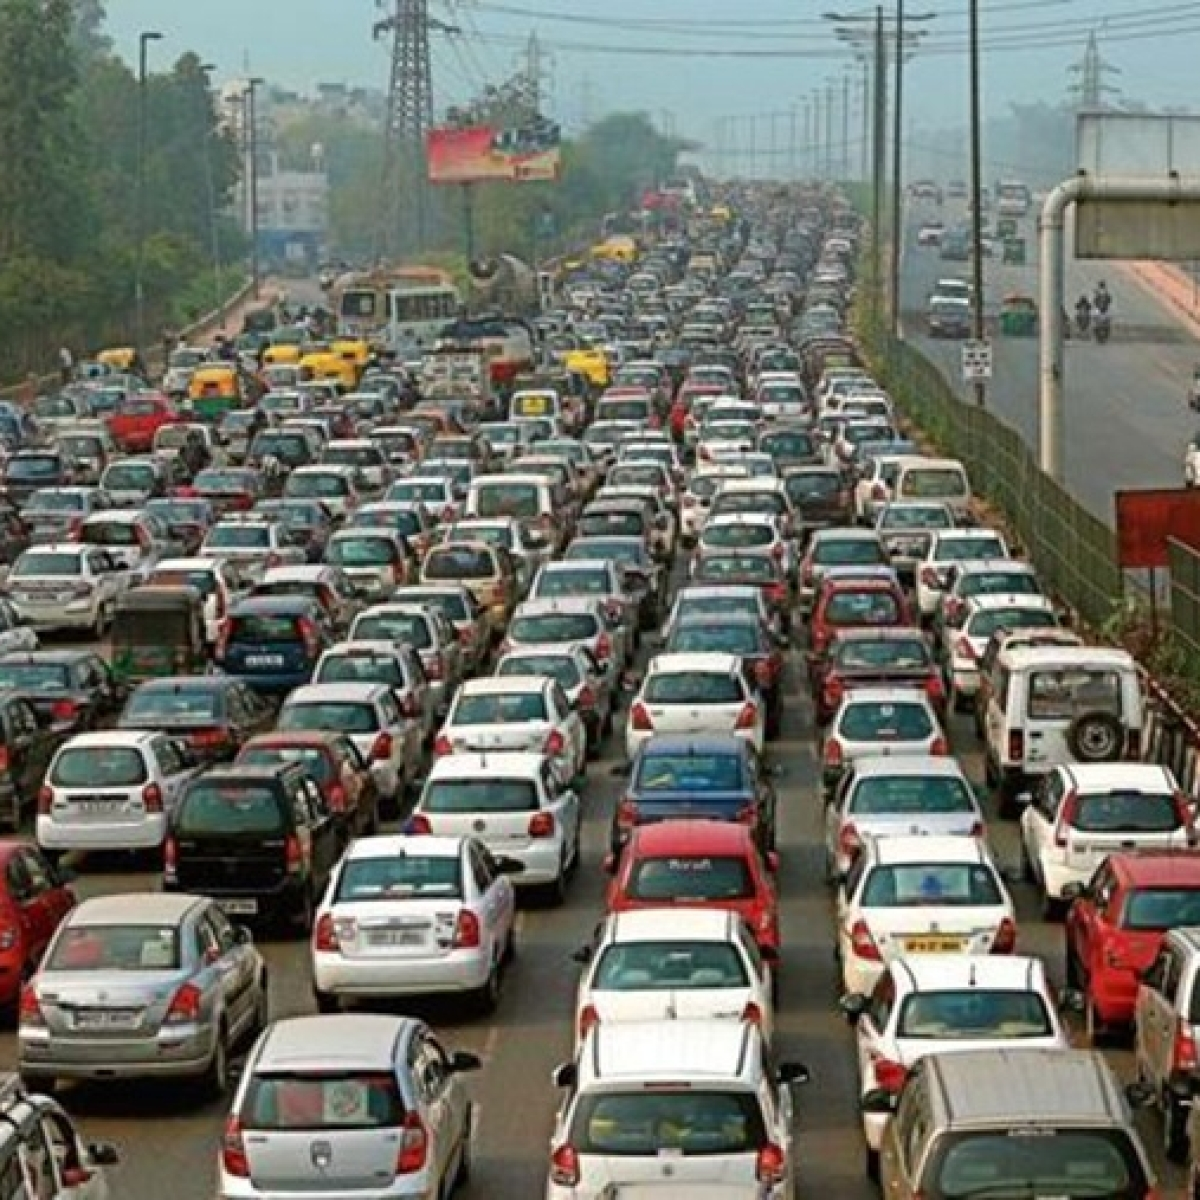 Mumbai Traffic Update: List of roads closed for repair on February 18, 2020